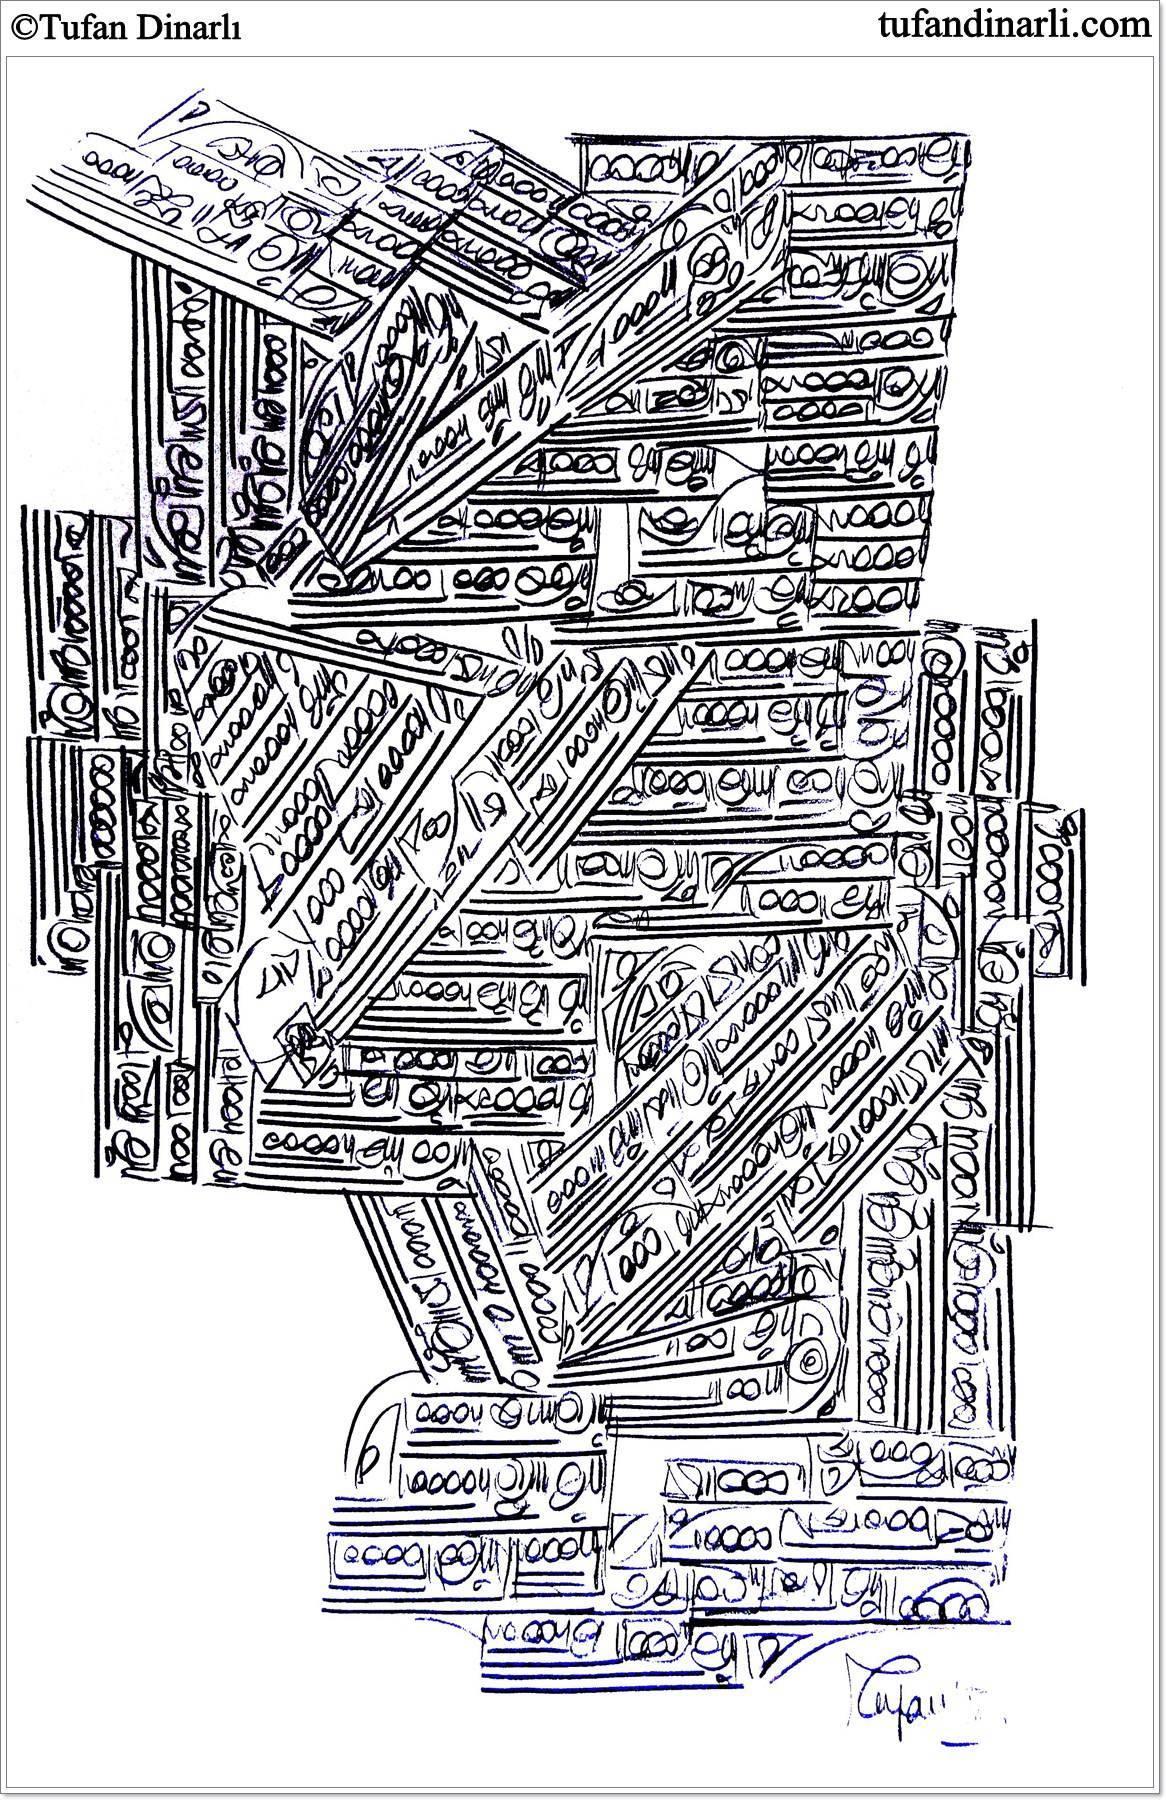 aracı,beyaz, ekipman, el ,eğitim, izole, karakalem, karmakarışık, kömür, okul ,oluşturma, orta, resim, sanat ,sanatçı, sarma, siyah ,süreç ,tedarik etmek, yaratıcı, yaratıcılık,çekmek, çizim, çubuk,arka plan, ayarlamak ,boyamak ,carbone ,darbe ,doku ,el, eleman, etkisi ,fırça, girdap, graffitti ,grunge ,grup, hat, illüstrasyon ,izole ,iş ,işareti, kalem,karakalem ,karalama, karalamak, kirli ,koyu ,kroki ,logolar, model, pastel boya, pergel ,sanat sembol, simge ,siyah, soyut ,spot ,sınır ,tahsilat ,tasarlamak ,taslak ,vektör,vintage, çerçeve ,çizilmiş, çizim,şekil,工具,白色,设备,手,教育,隔离,铅笔,复杂,煤,学校,建, 中,绘画,艺术,艺术家,包裹,黑色,工艺,供应,创 意,创造 力,绘制,绘 图,酒吧,背景,调整,油漆,碳,影响,纹理,手,内容,效果,画笔,漩涡, 涂鸦,垃圾,集团,帽子,插图,隔离,业务,标志,钢 笔,铅笔, 涂鸦,涂 鸦,肮脏,黑暗,素描,图案,模型,粉彩,绘画,符号,图标,黑色,抽象,现 货,边框,集合,设计,绘图,向量,复古,边框,绘制,绘图 tool, white, equipment, hand, education, isolated, pencil, intricate, coal, schools, build, medium, painting, art, artist, wrap, black, process,supply, creative, creativity, draw, drawing, bar,background, adjust, paint, carbon, impact, textures, hand, elements, effects, brush, swirl, graffiti, grunge, group, hat,illustration, isolated, business, sign, pen, pencil, scribble, scribble, dirty, dark , sketch, logo, model, pastel, drawing, symbol, icon, black, abstract, spot, border, collection,design, drawing, vector, vintage, frame, drawn, drawing,Инструмент белый оборудование, ручные, образование, изолированные, карандаш, замысловатые, уголь, школы,строить, средний, живопись, искусство, художник, обертывание, черный, процесс, снабжение, творческий, творчество, рисовать, рисовать, бар,фон, настроить, краски, уголь,влияние, текстуры, кисти, элементы, эффекты, кисти, вихрем, граффити, гранж, группа, шляпа, иллюстрация, изолированный, бизнес, знак, ручка, карандаш, каракули, каракули, грязный, темный , эскиз, логотип, модель, пастель, рисунок, символ, икона, черный, аннотация, пятно, граница, сбор, дизайн, рисунок, вектор, винтаж, рамки, обращается, рисование,herramienta, blanco, equipo, mano, educación, ais